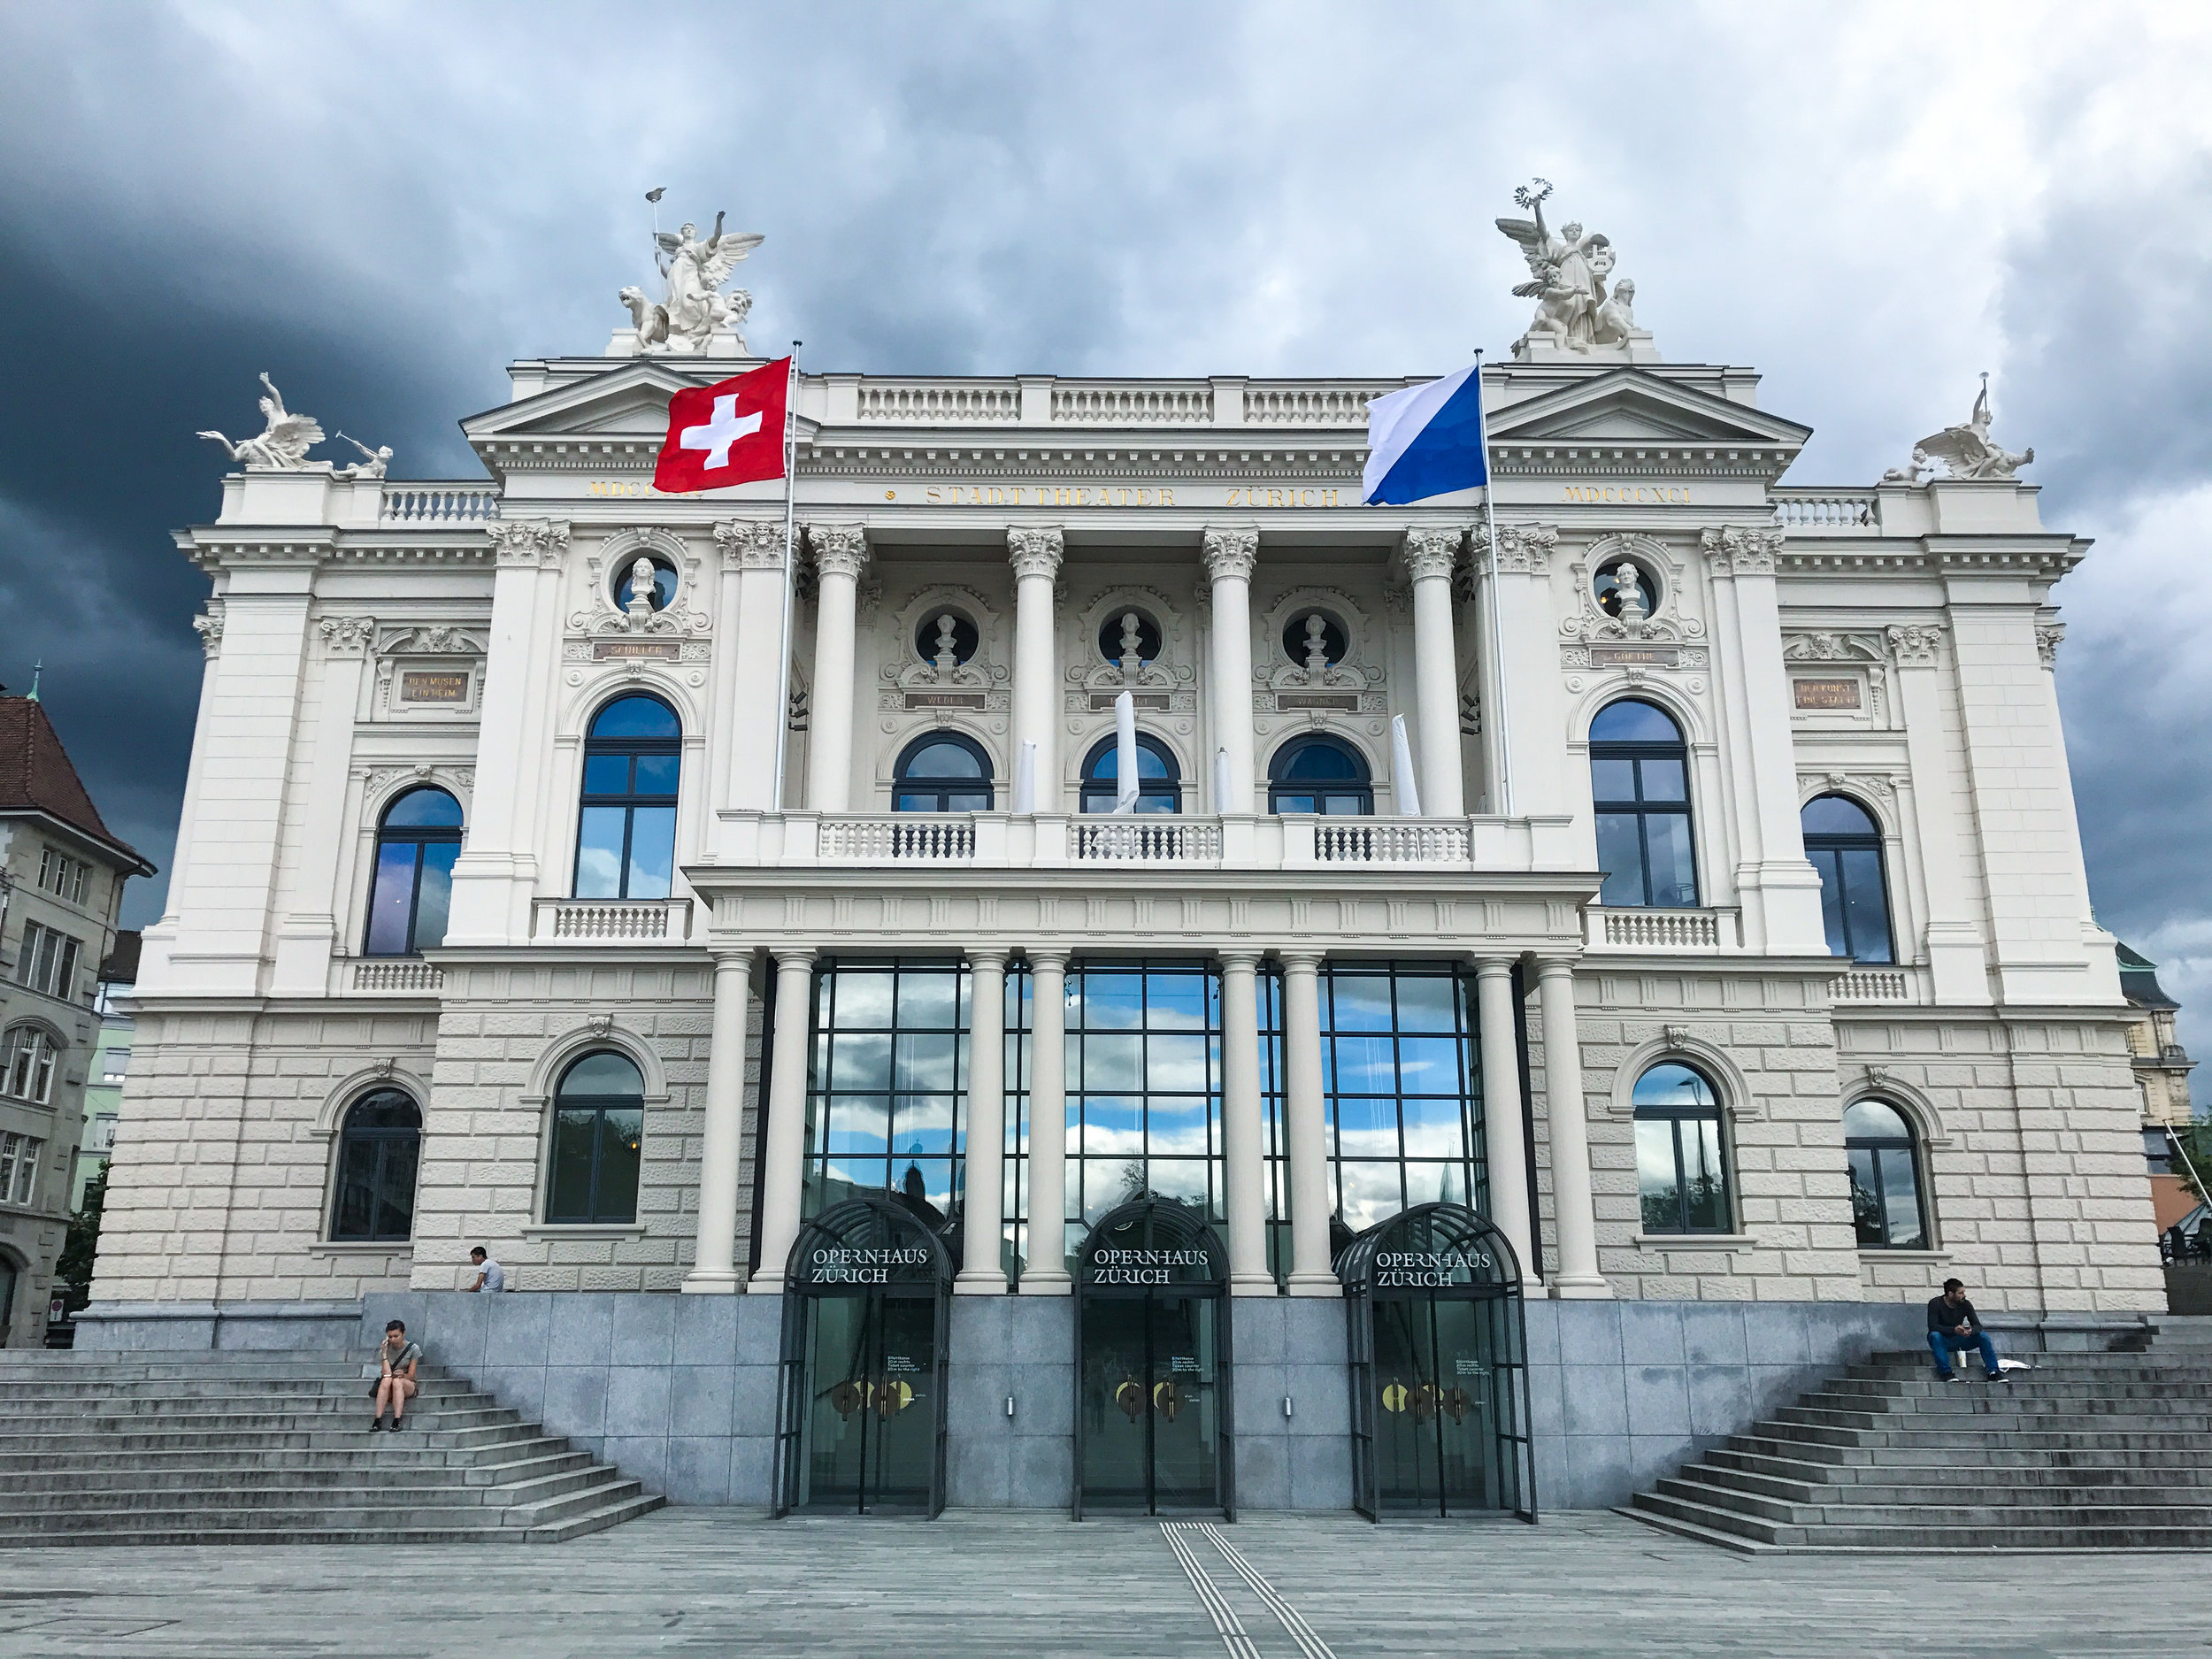 The Opernhaus